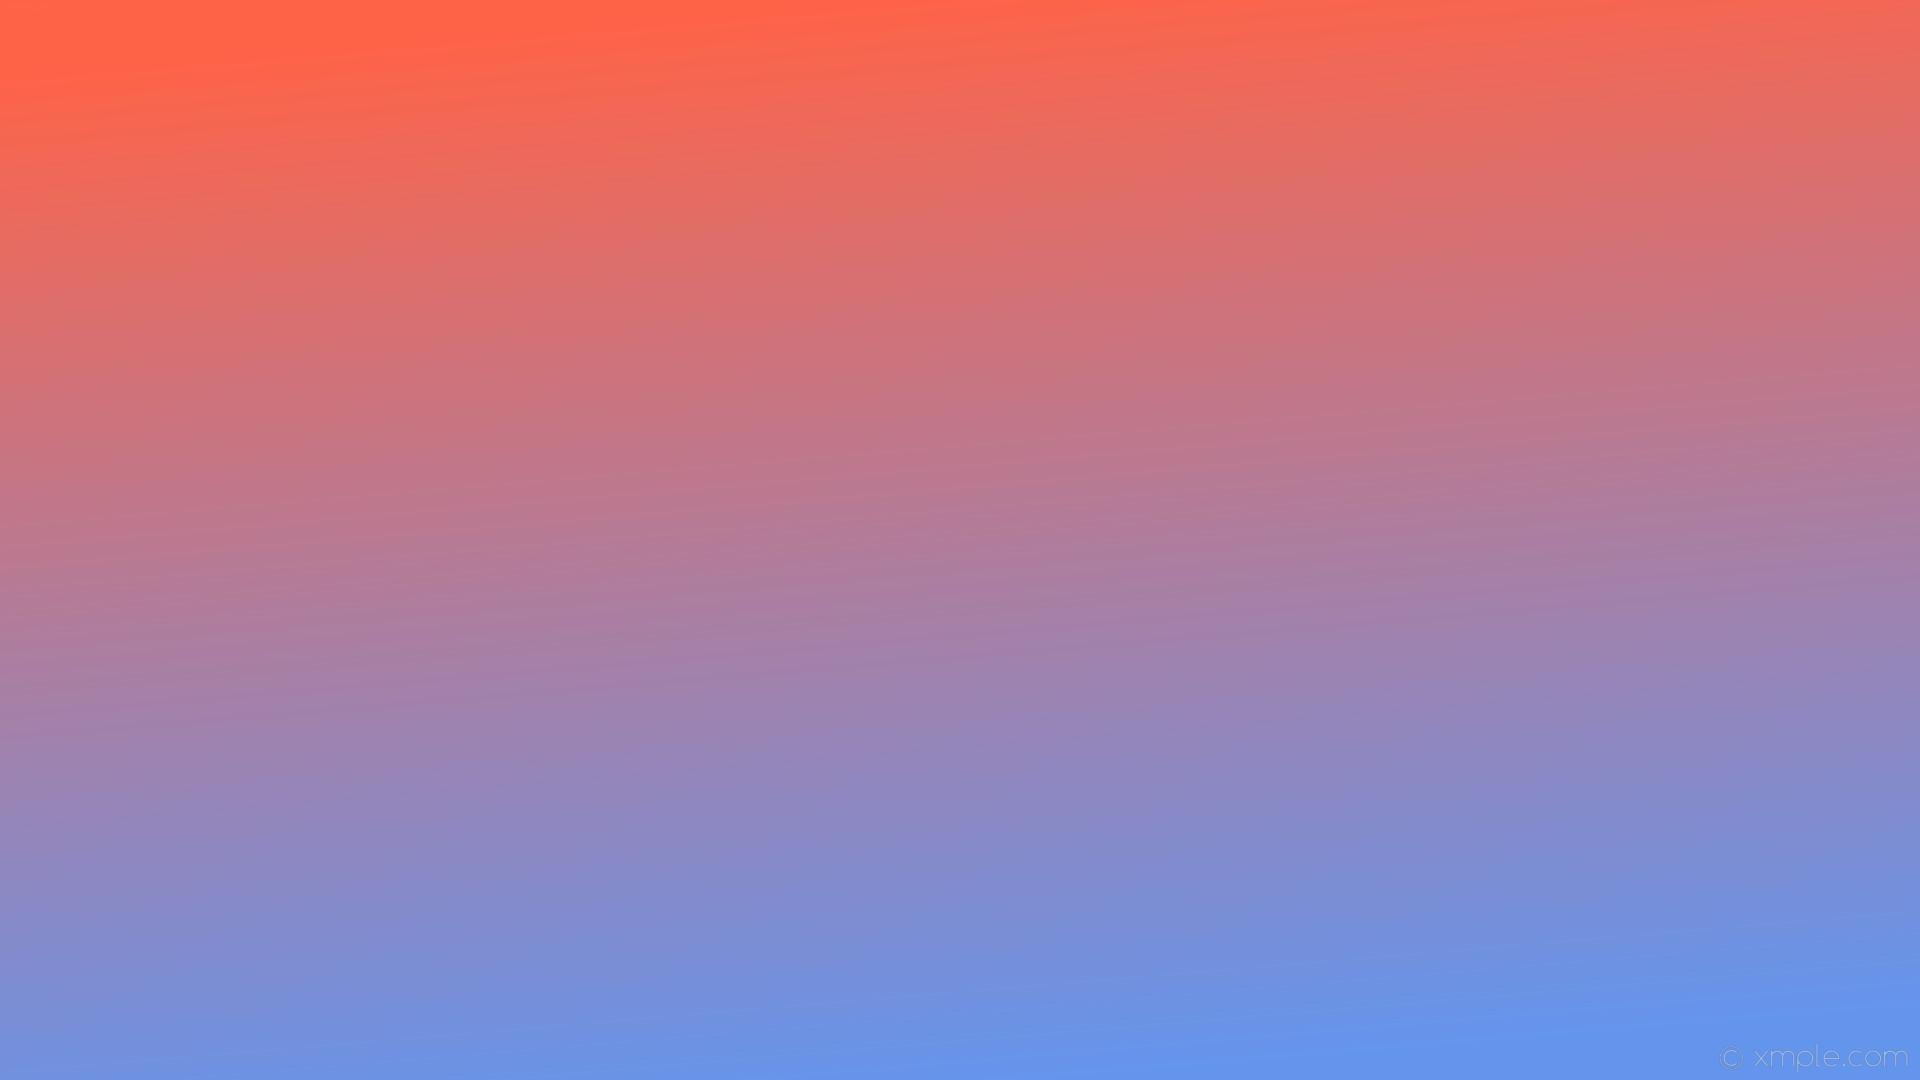 wallpaper linear orange blue gradient cornflower blue tomato #6495ed  #ff6347 285°